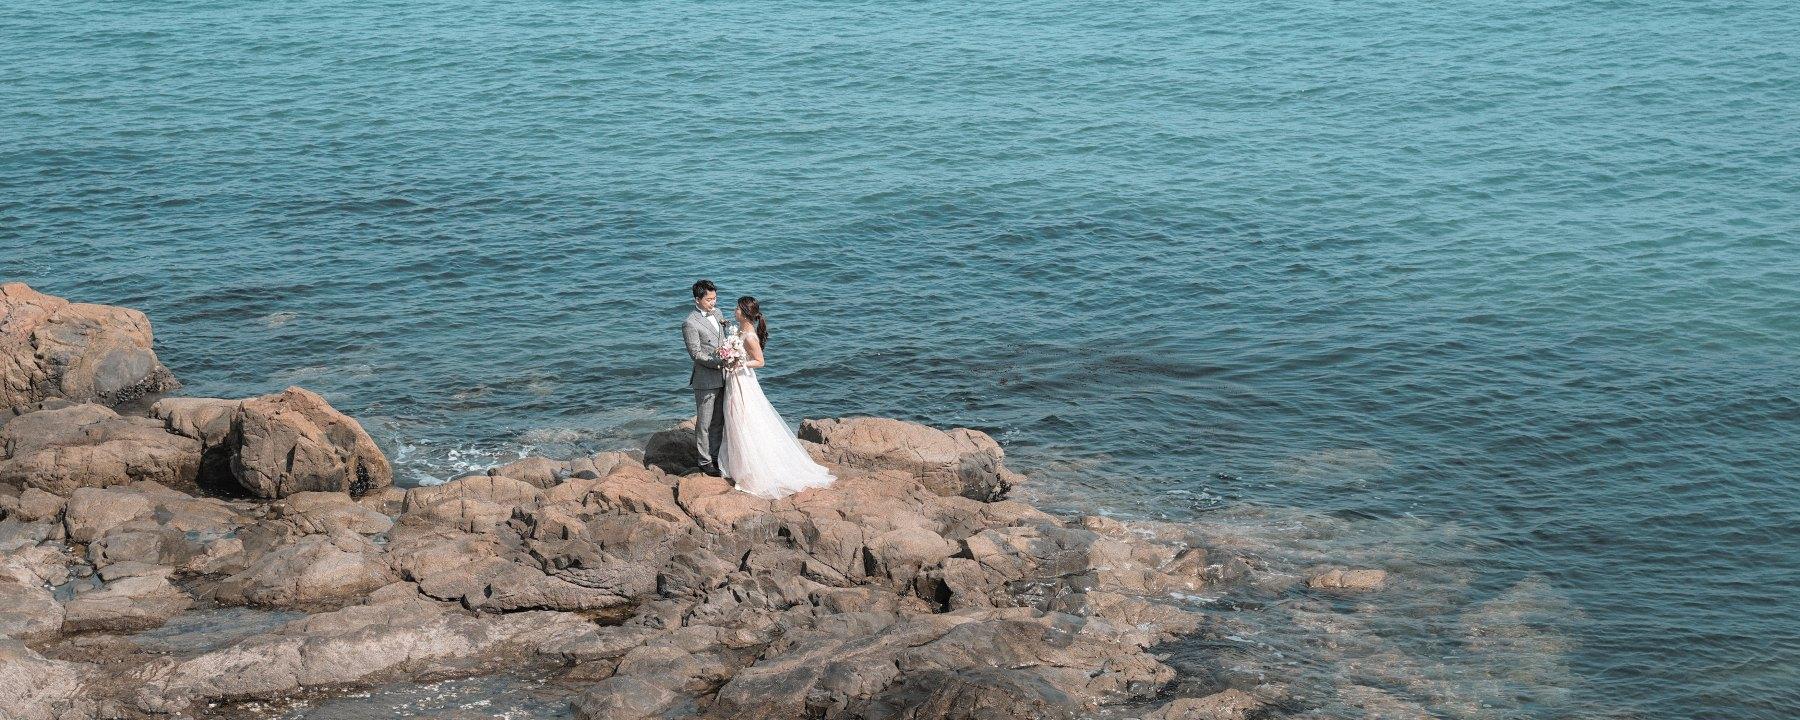 wedding, marriage, love, sonnet 116, beach wedding